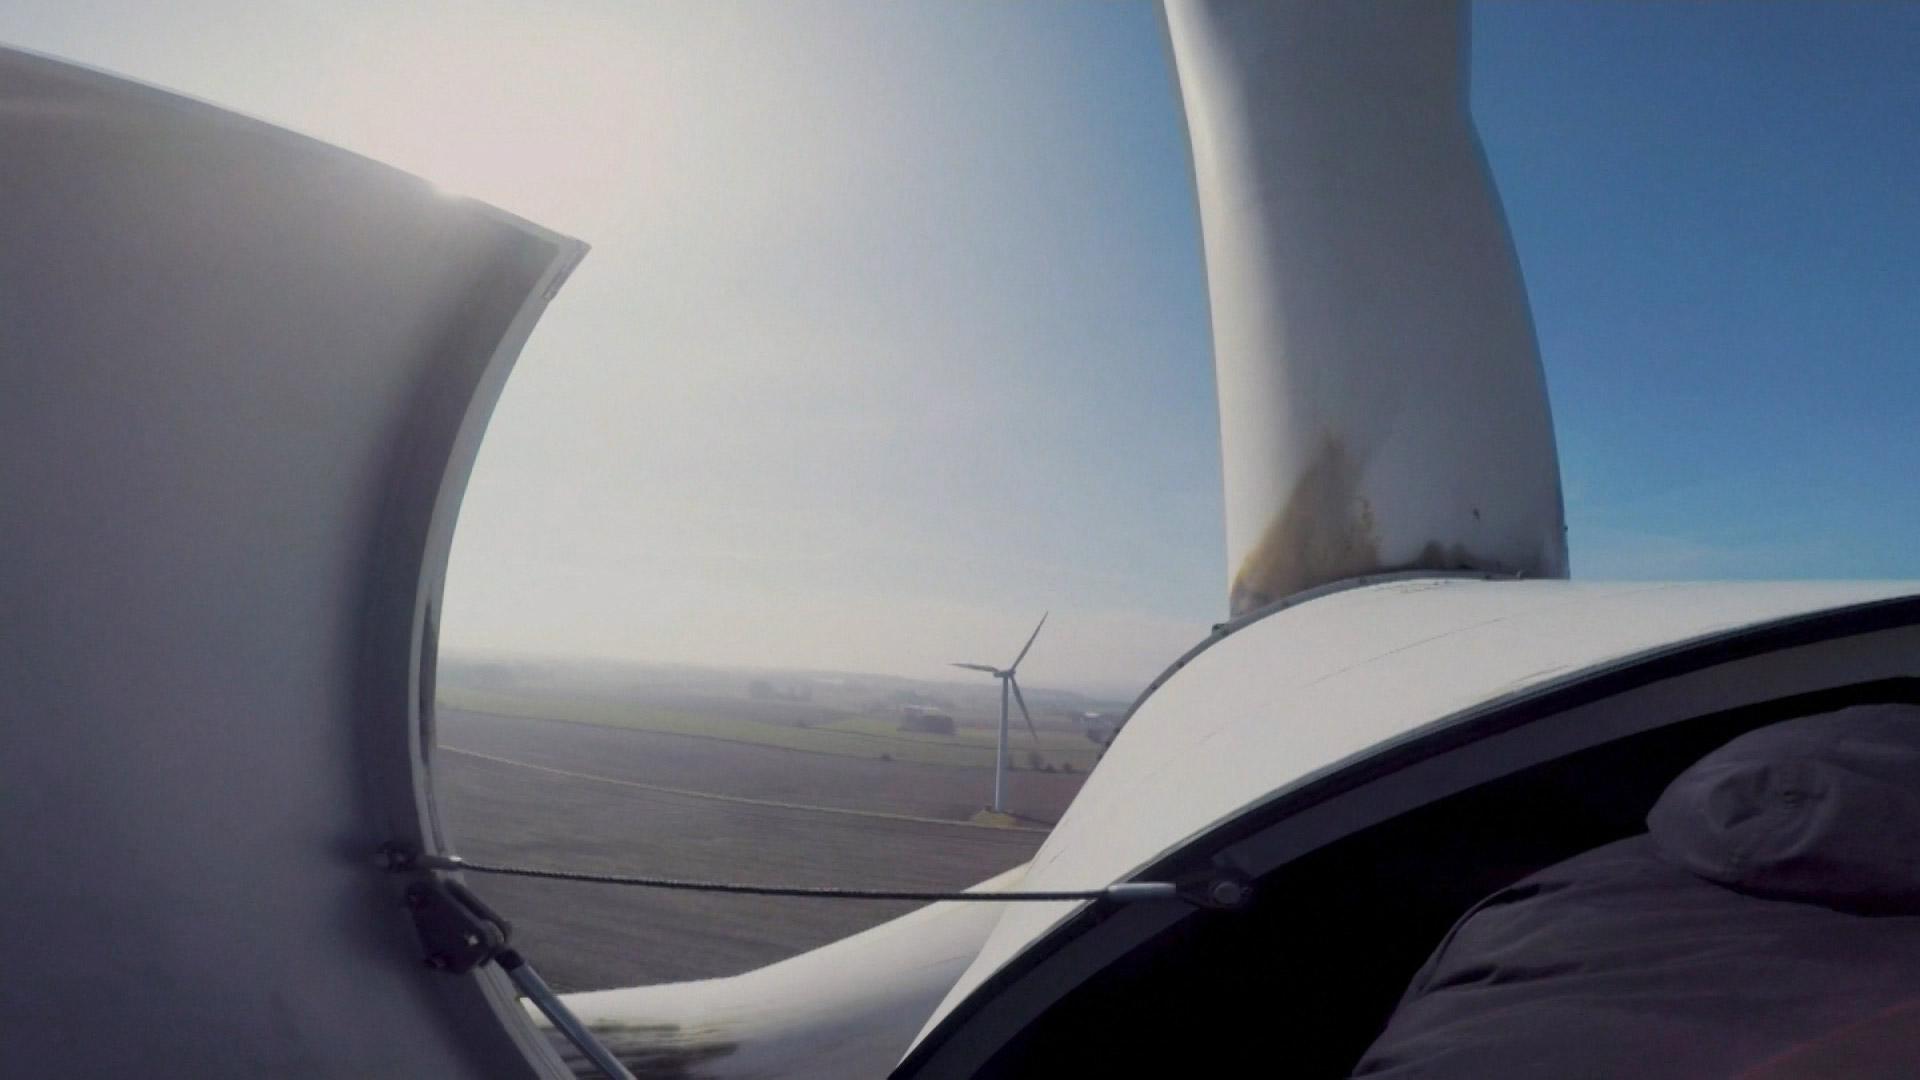 S1 E5: Winds of Change